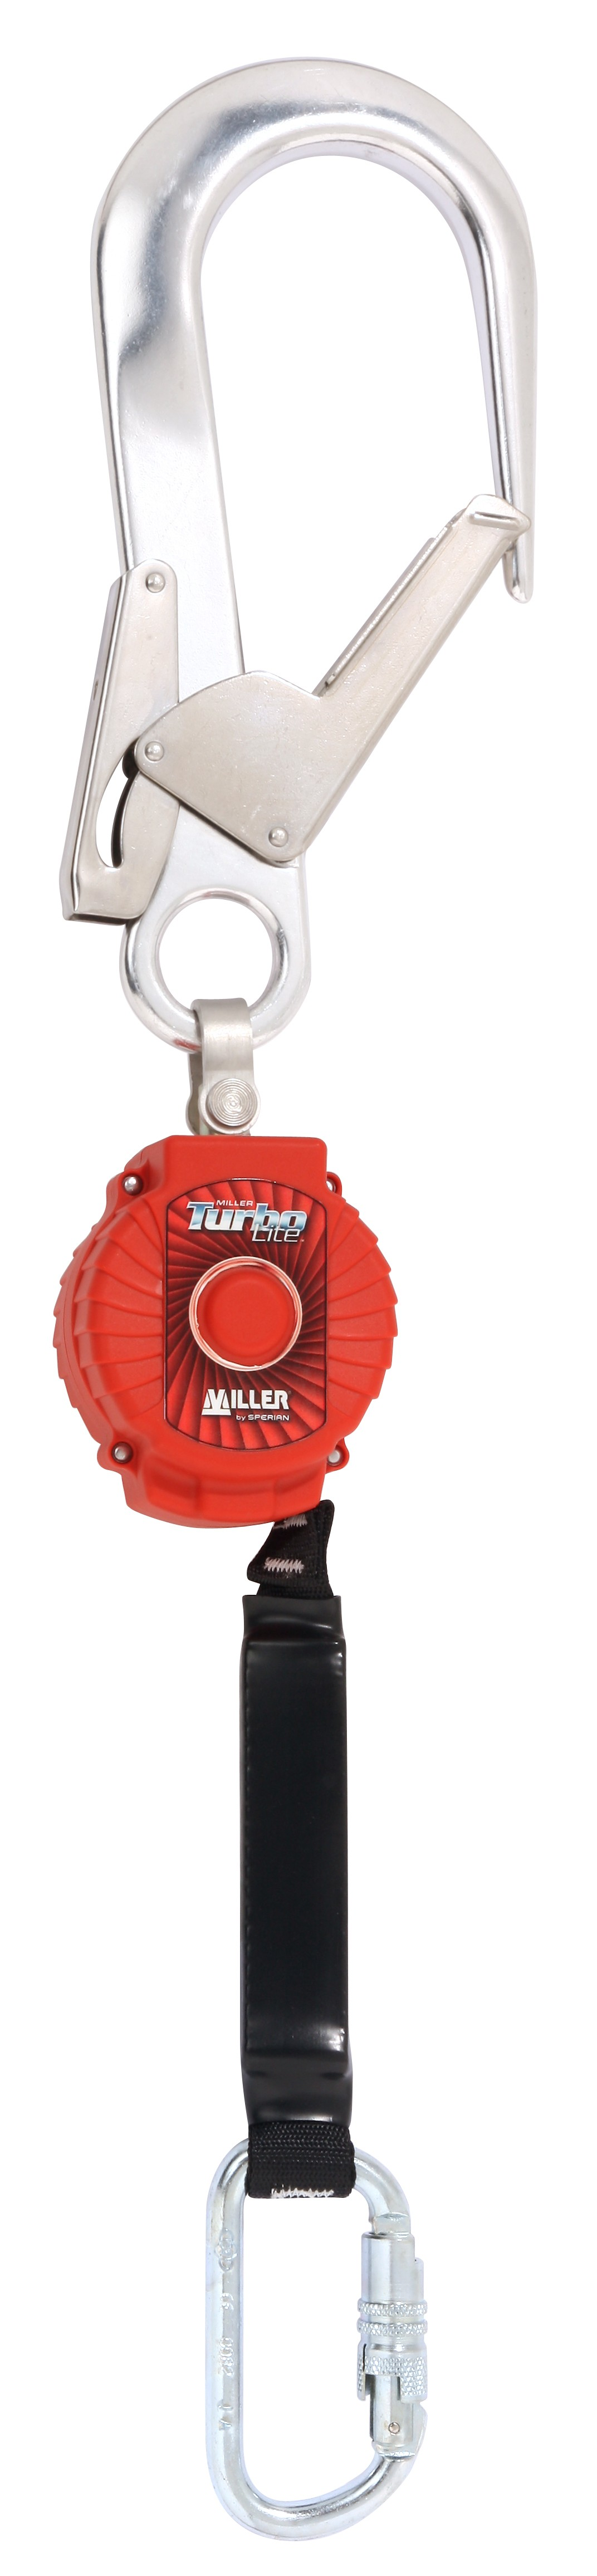 Miller Turbolite